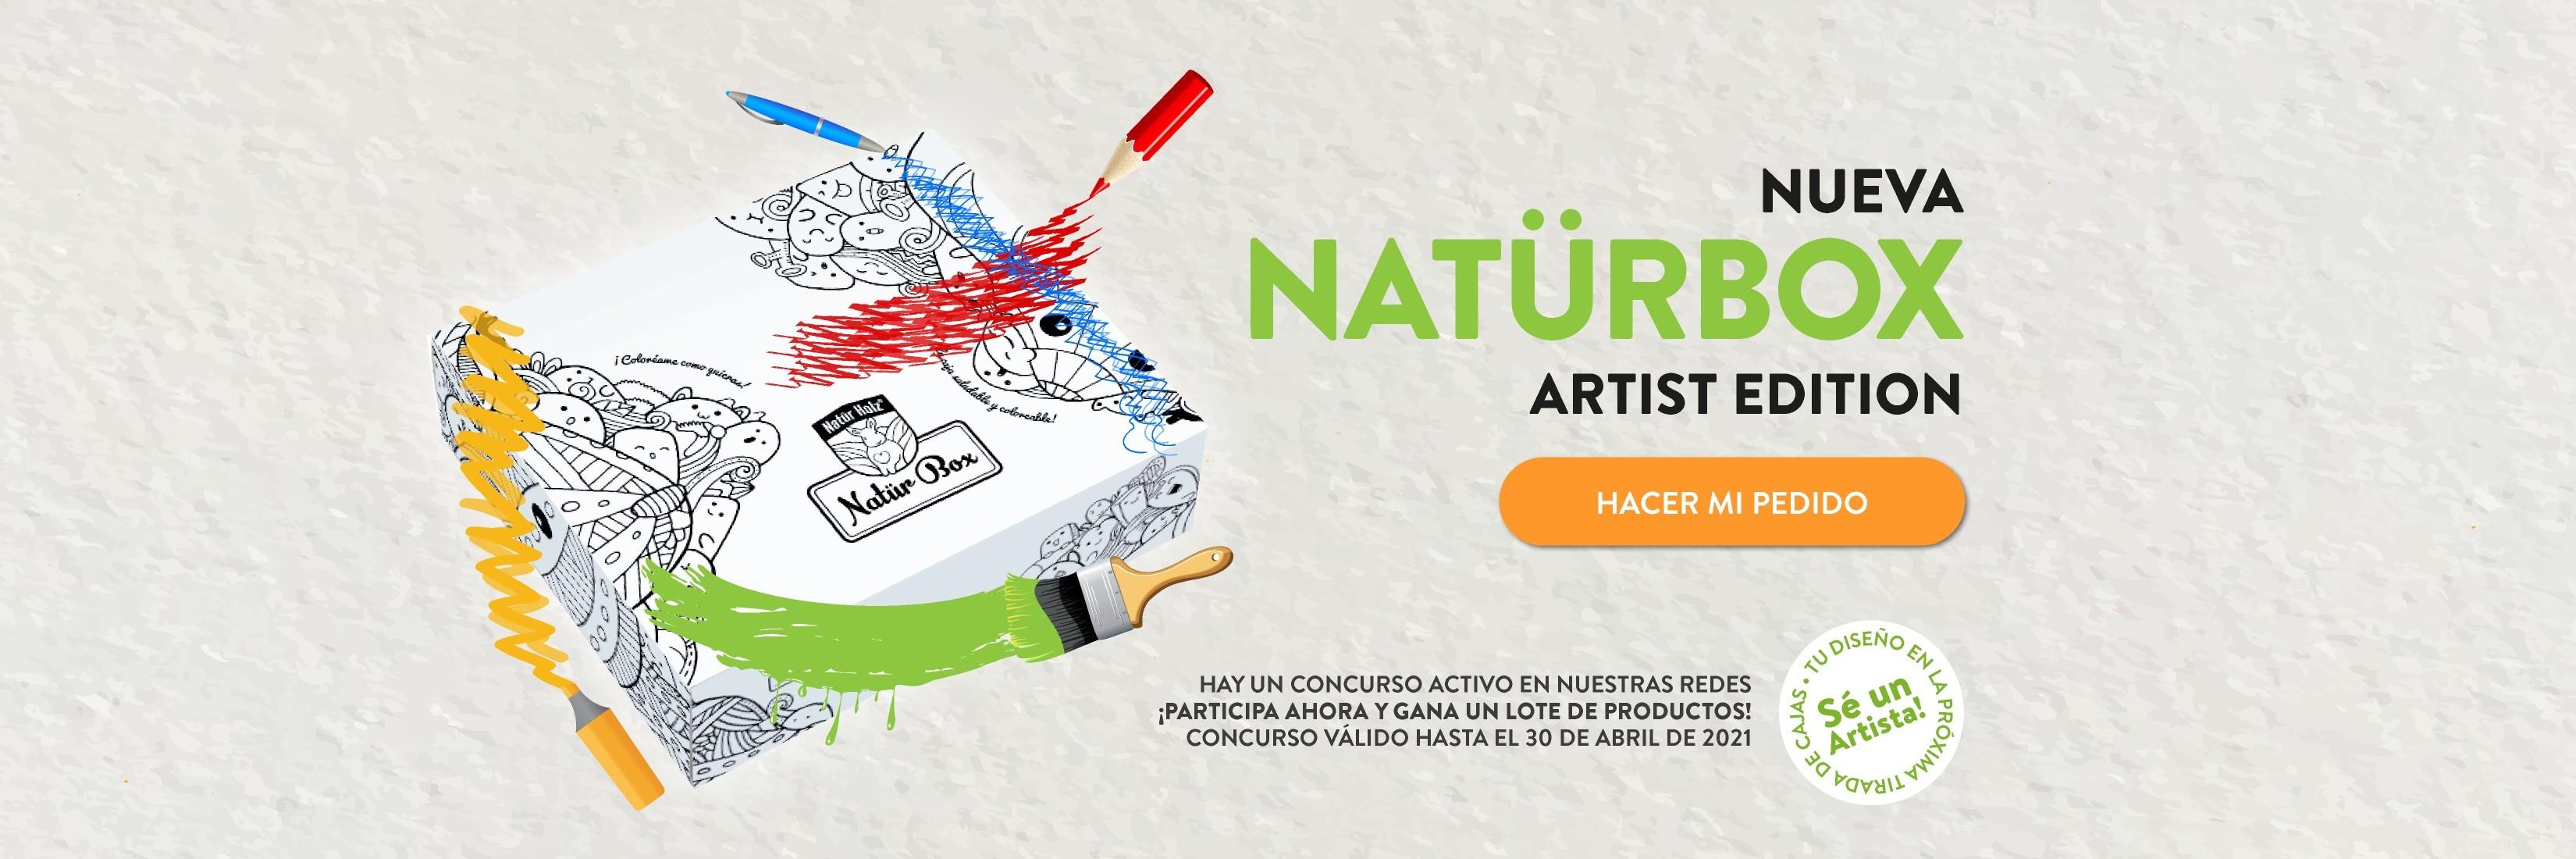 NaturBox Artist Edition